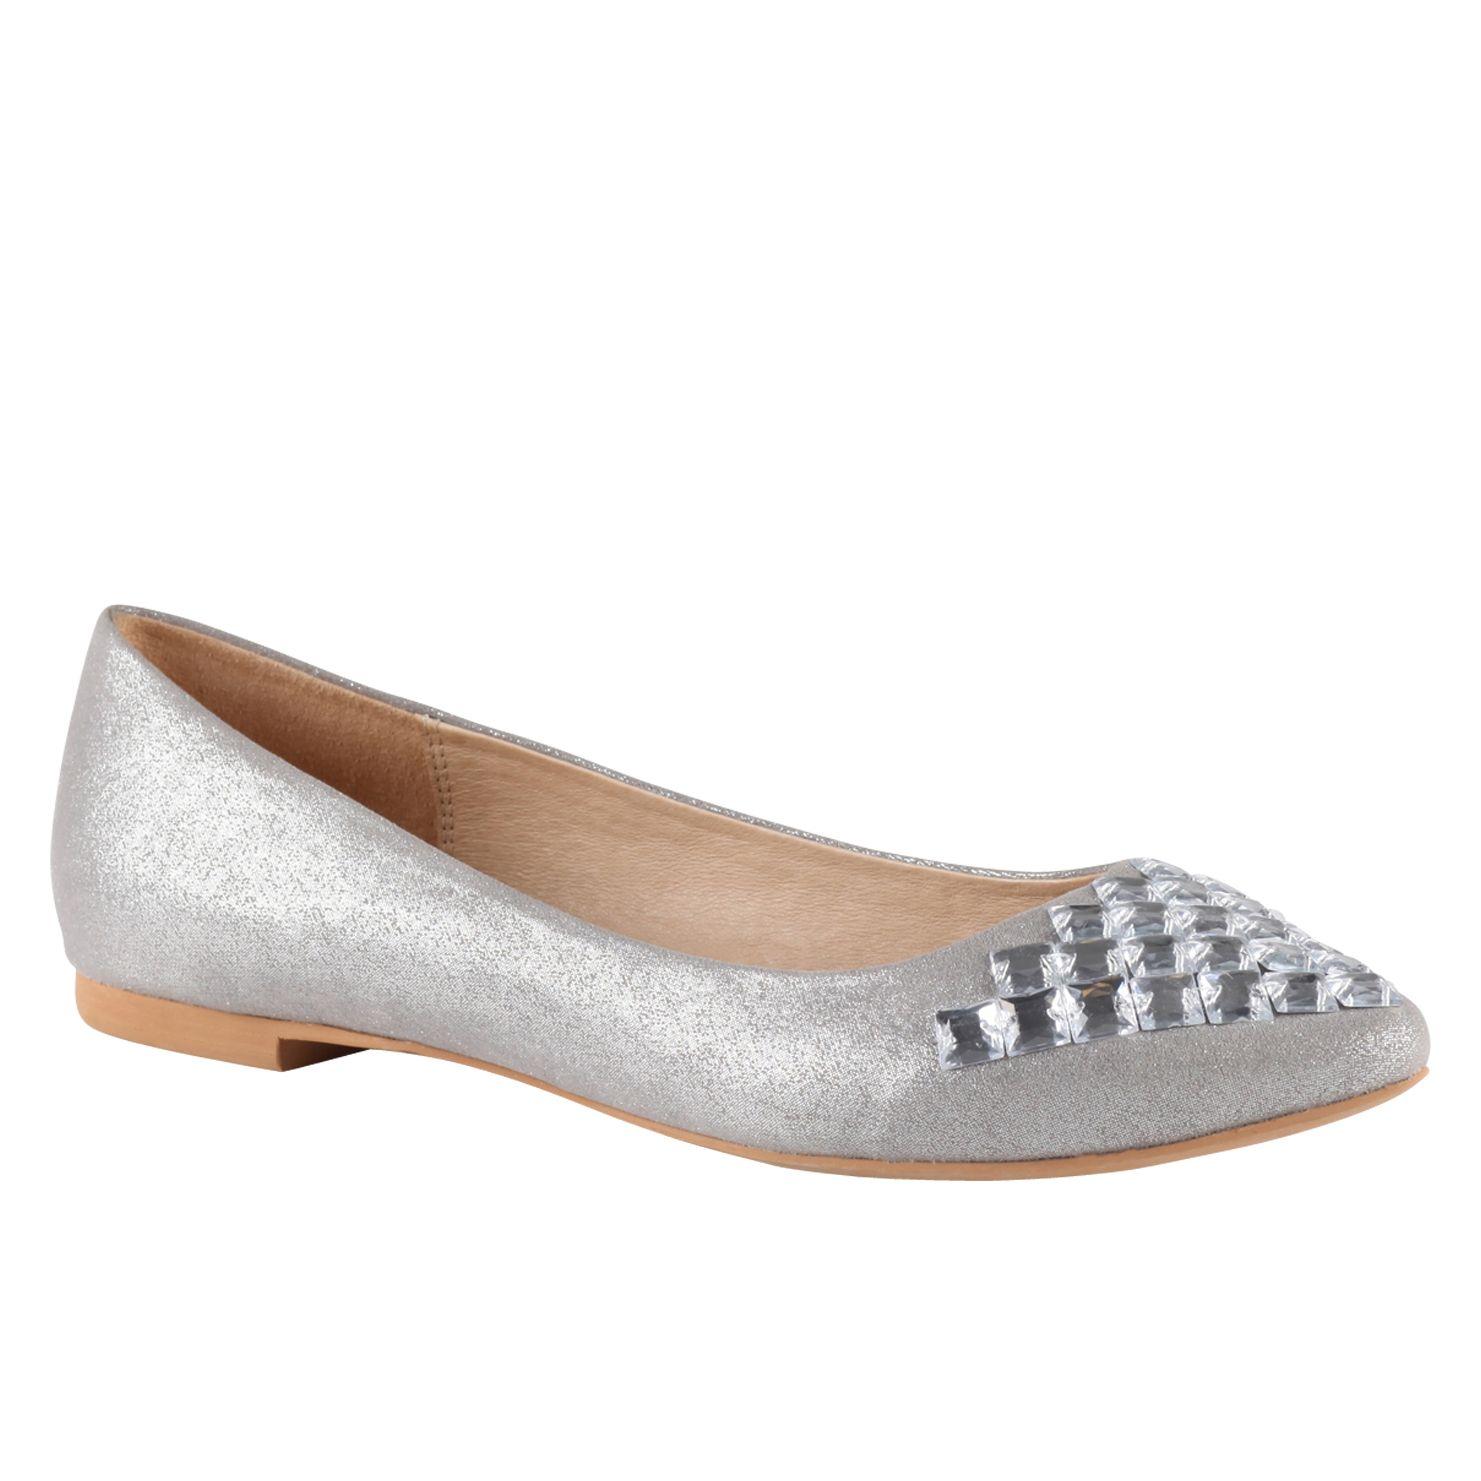 Aldo - Οι καλύτερες τιμές online σε γυναικεία, ανδρικά και παιδικά παπούτσια Aldo Greece - Προσφορές και εκπτωτικά κουπόνια για φθηνές αγορές.